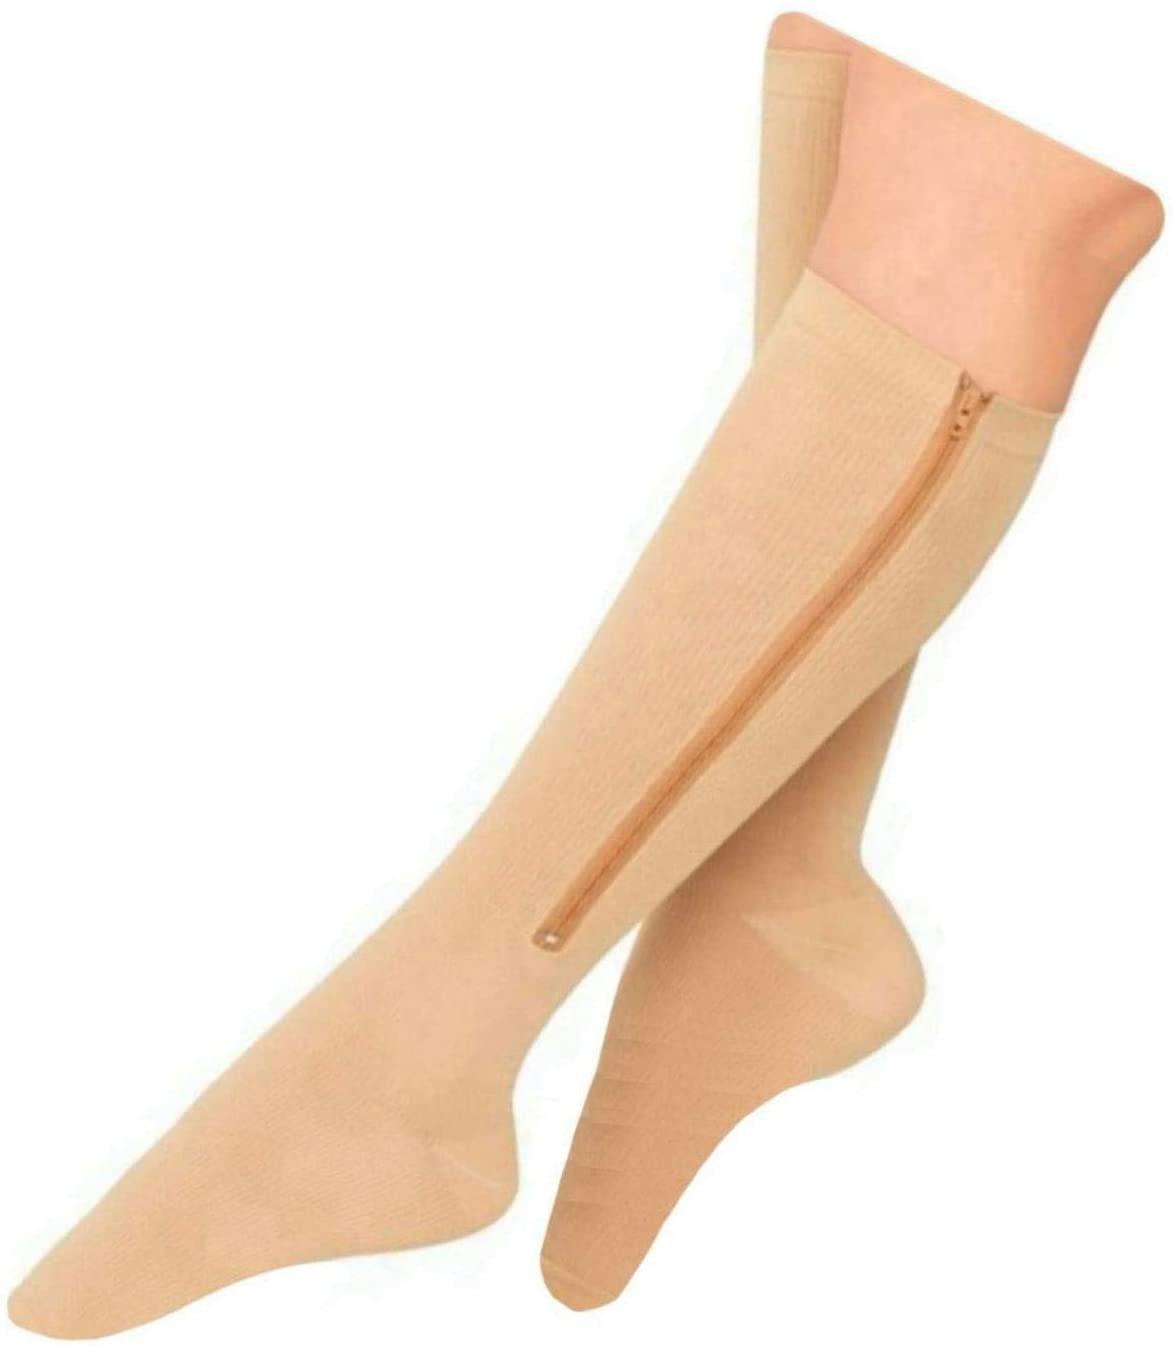 Presadee Kid's Edition Easy Zipper Compression Socks Knee Length Energize Leg Circulation Performance Fatigue Support (Closed Toe Beige, S/M)